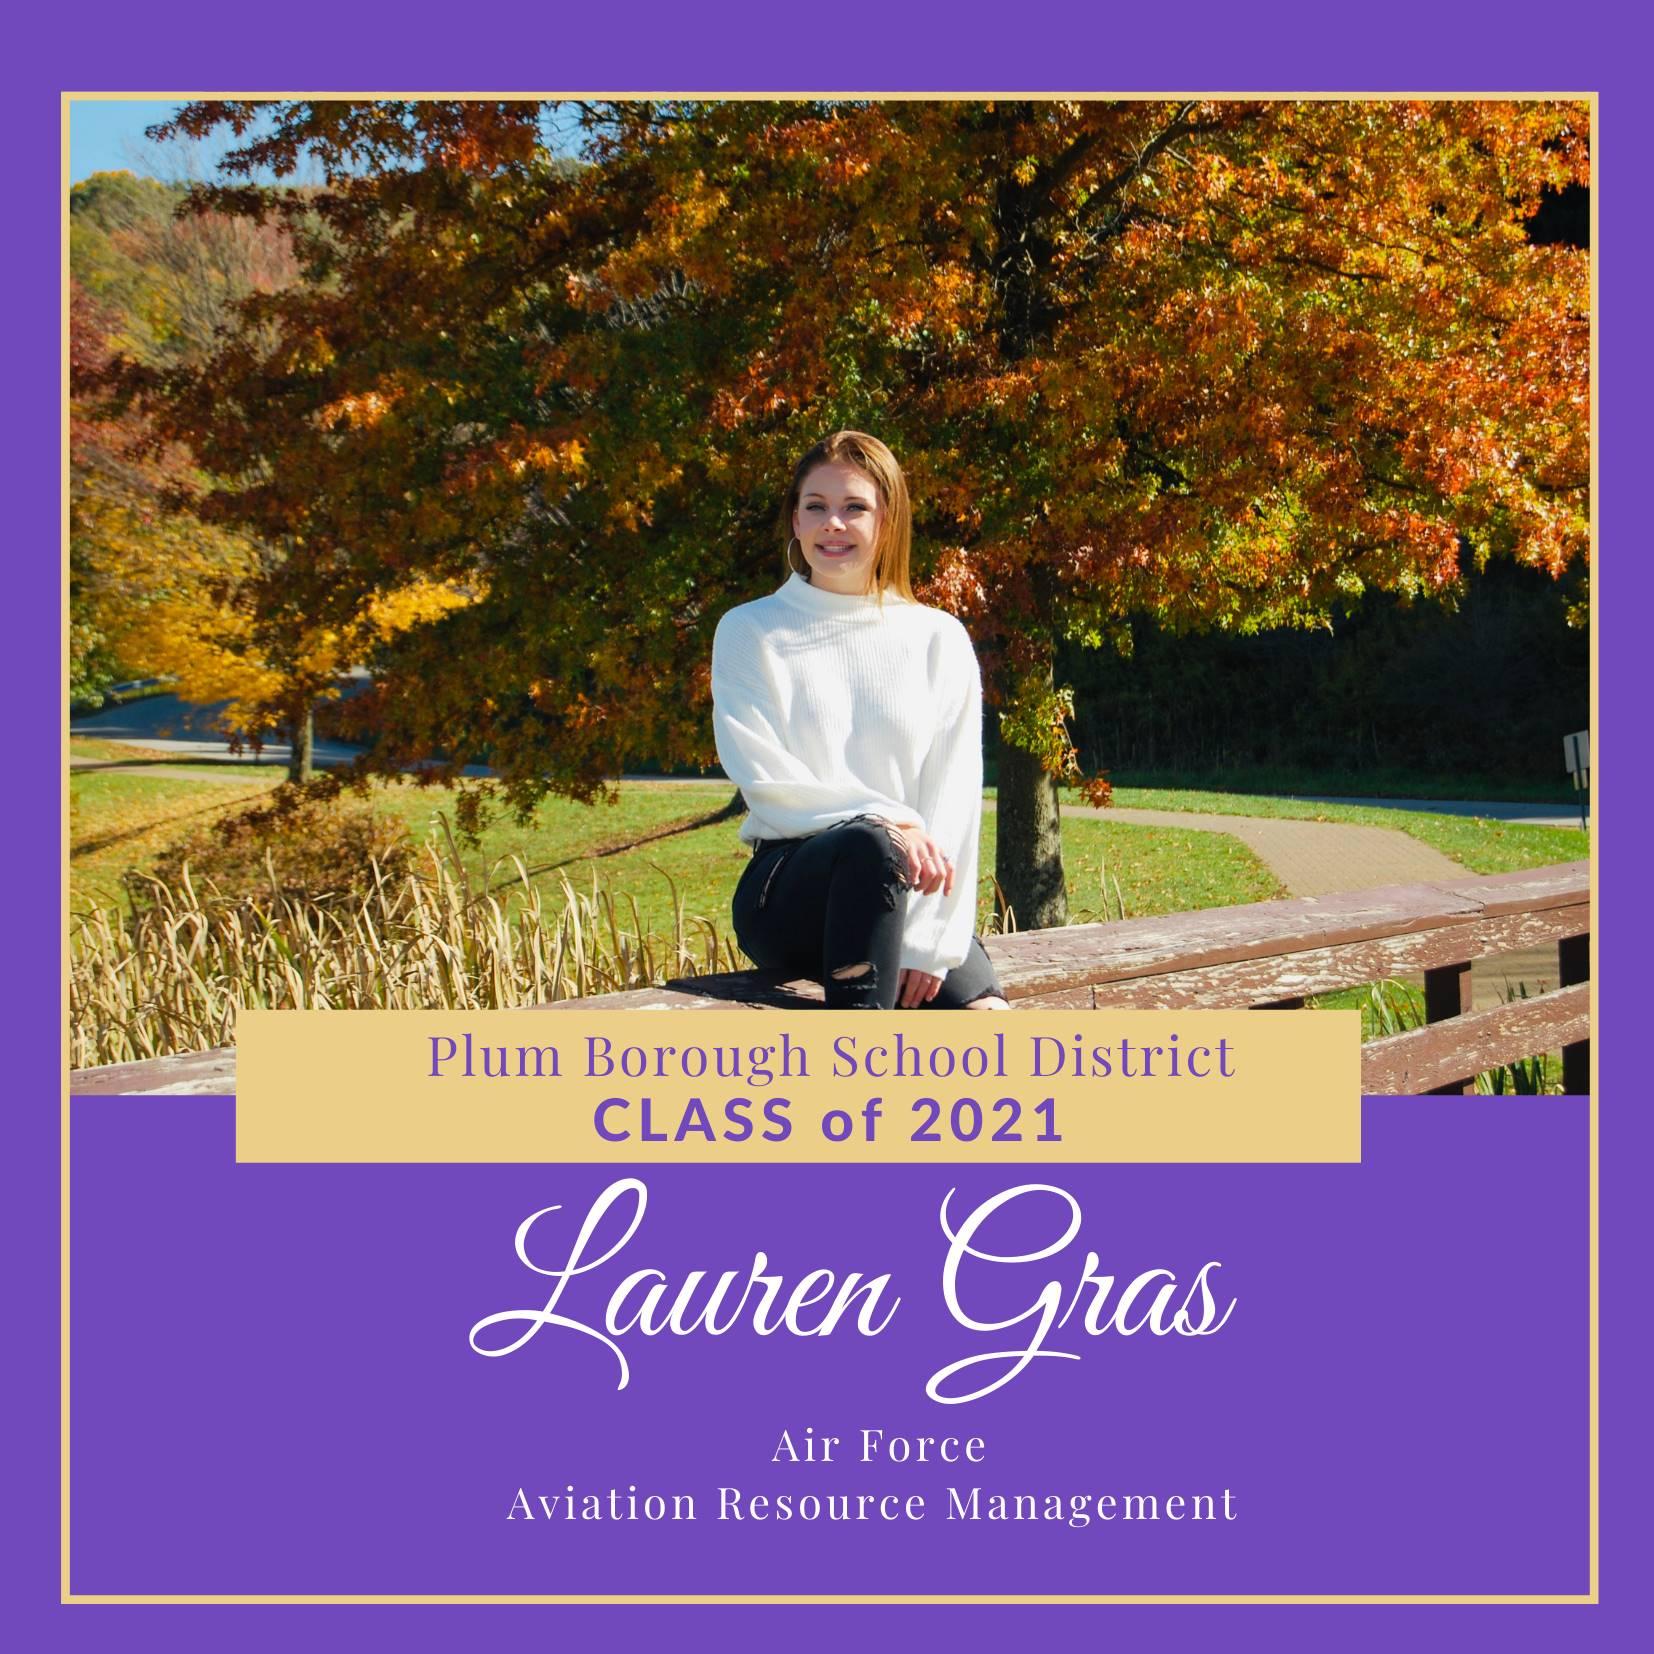 Congratulations to Lauren Gras, Class of 2021!